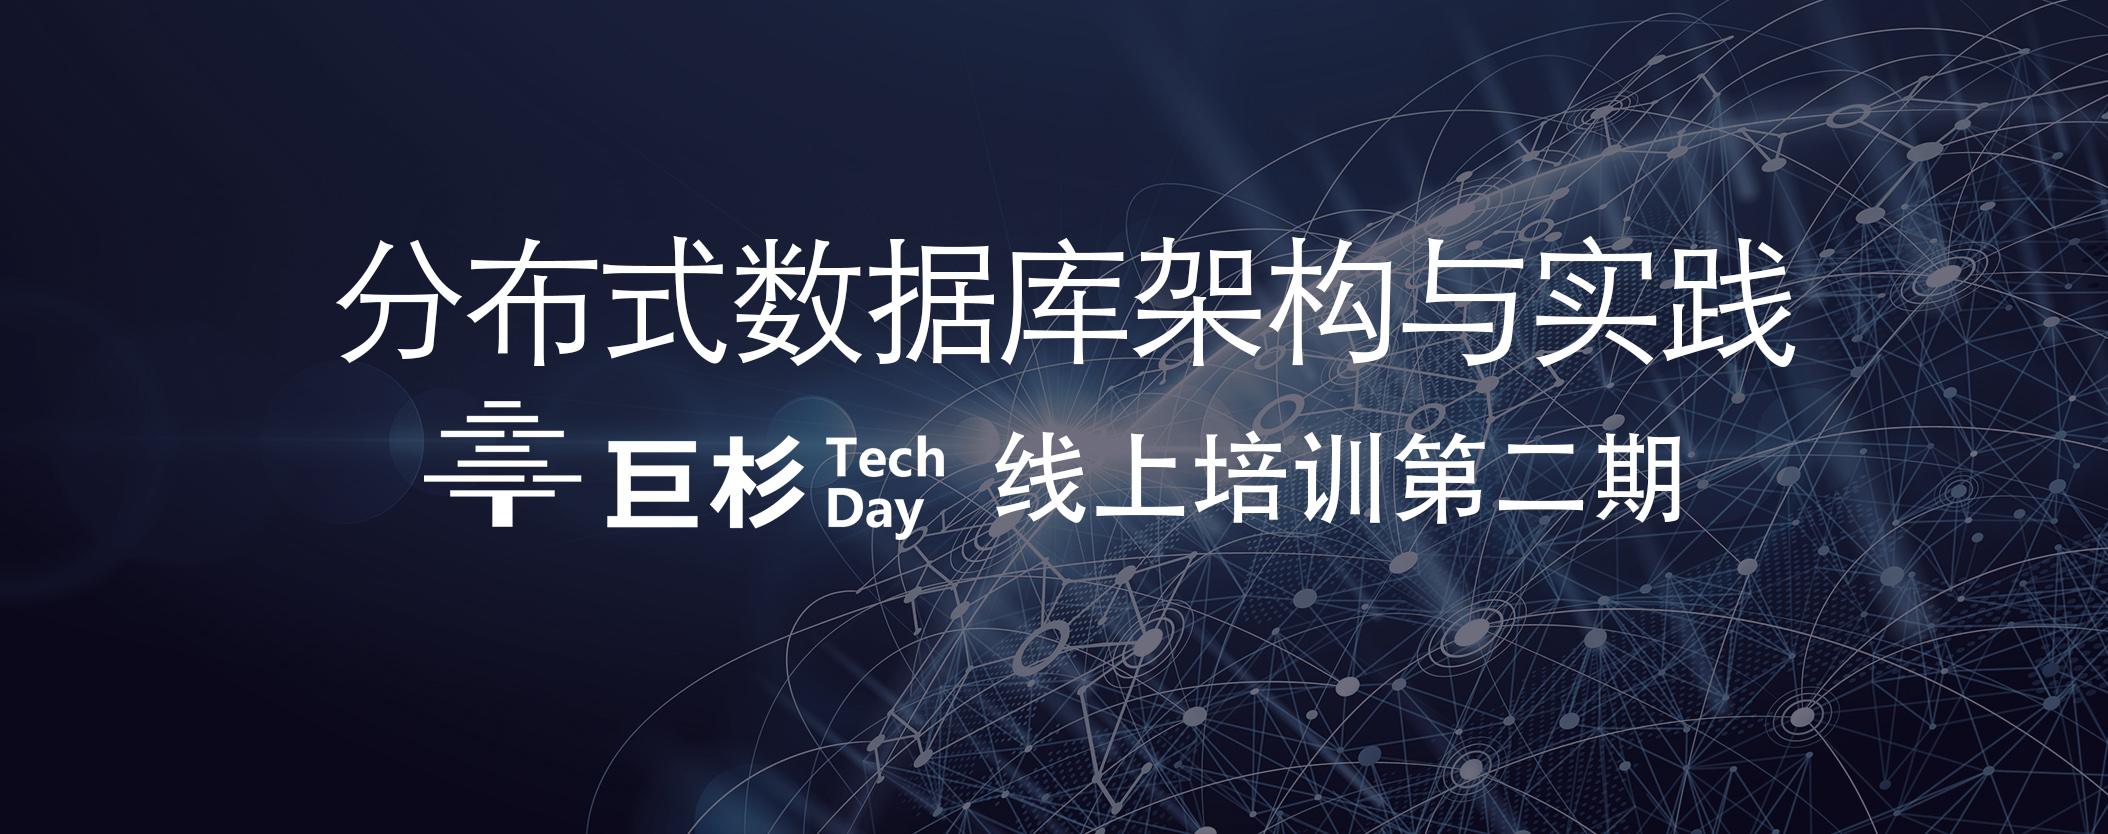 techday线上-2.jpg